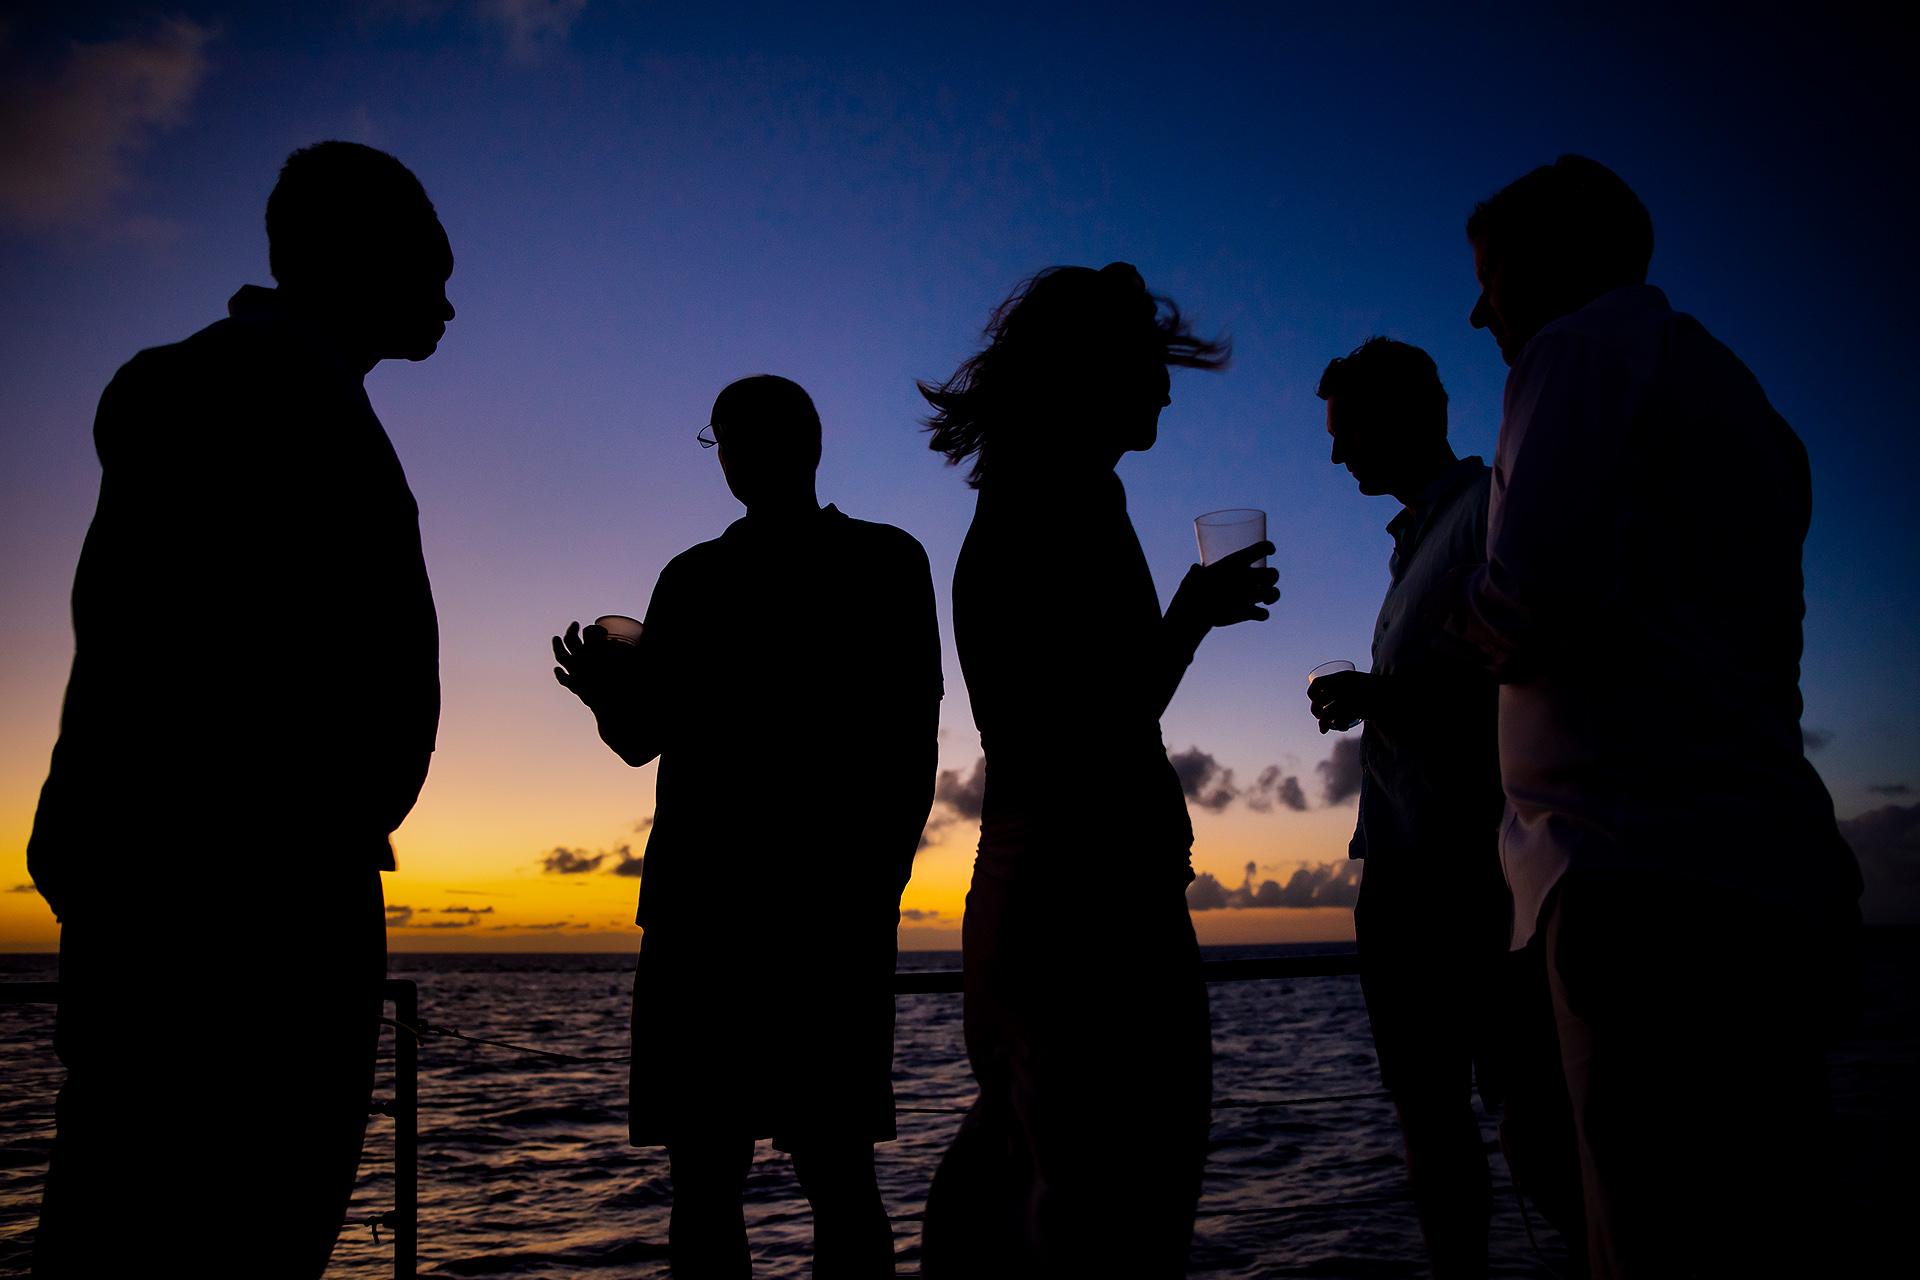 St. Lucia Elopement Wedding at Sunset | cocktails on a sunset catamaran cruise